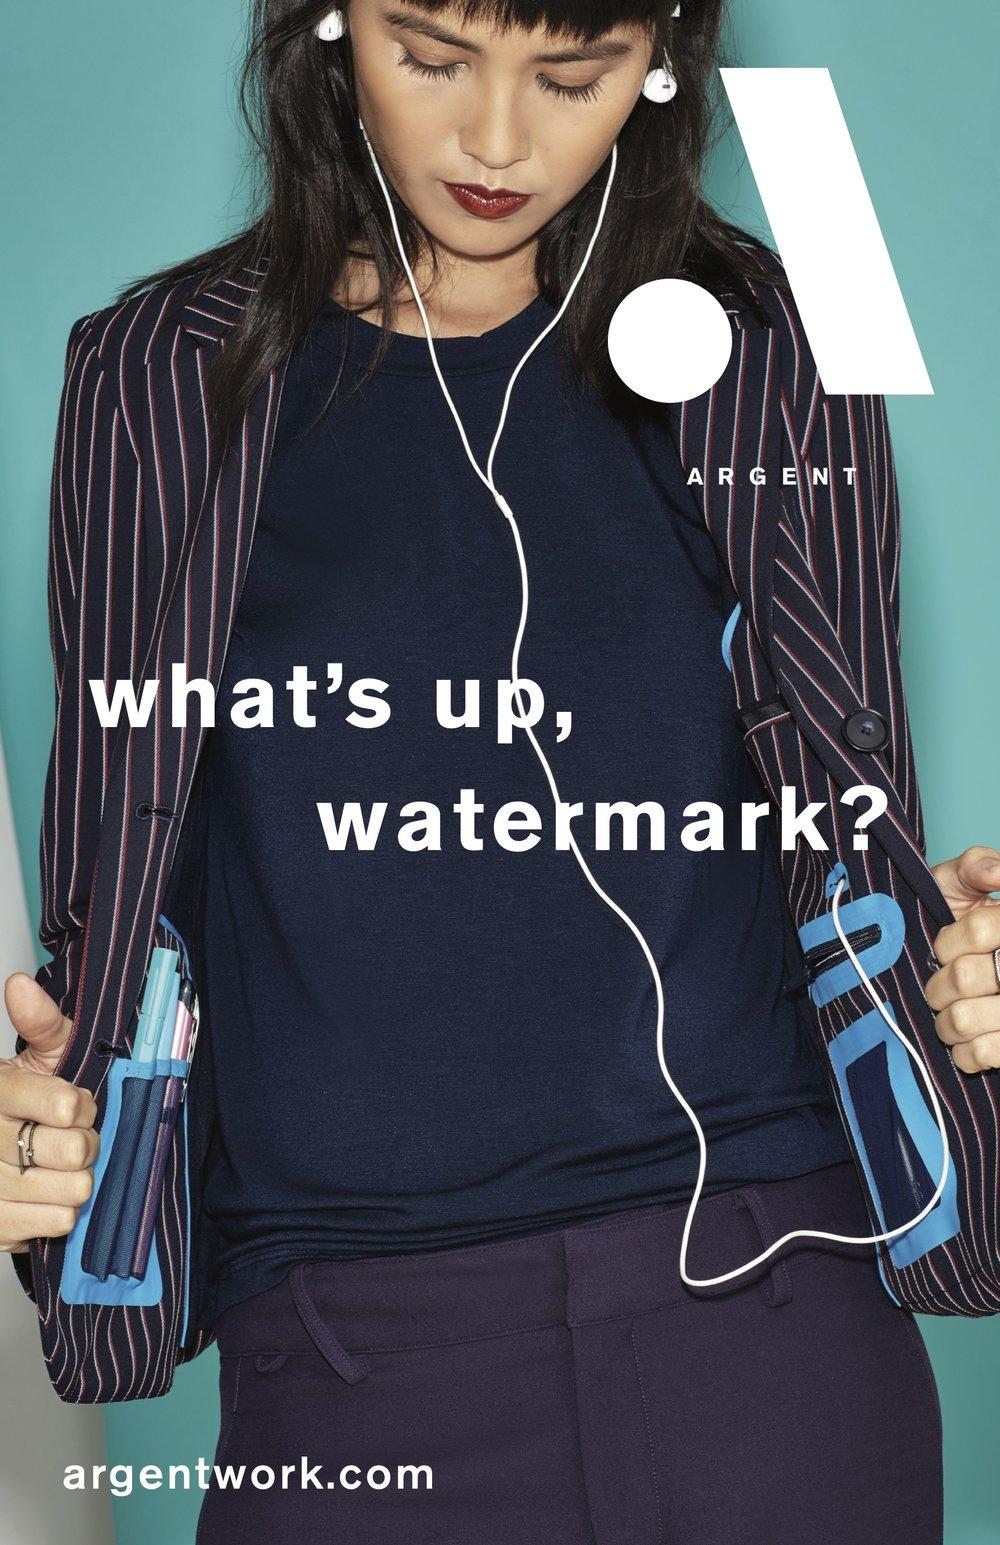 watermark_poster_2_11x17.jpg